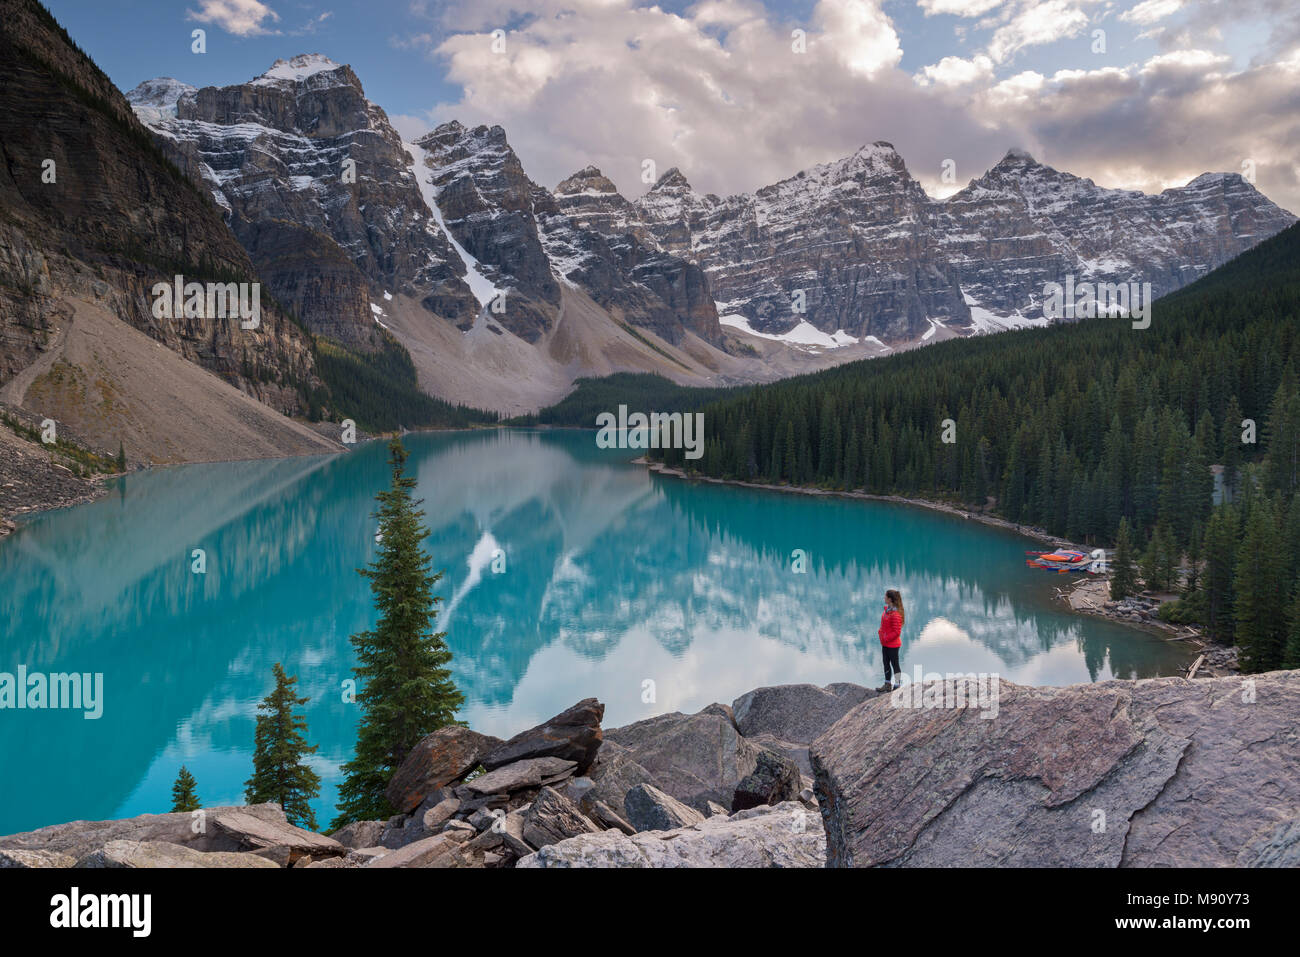 Frau Suchen über Moraine Lake Rockpile, aus den kanadischen Rocky Mountains, Banff National Park, Alberta, Kanada. Herbst (September) 2017. Stockbild